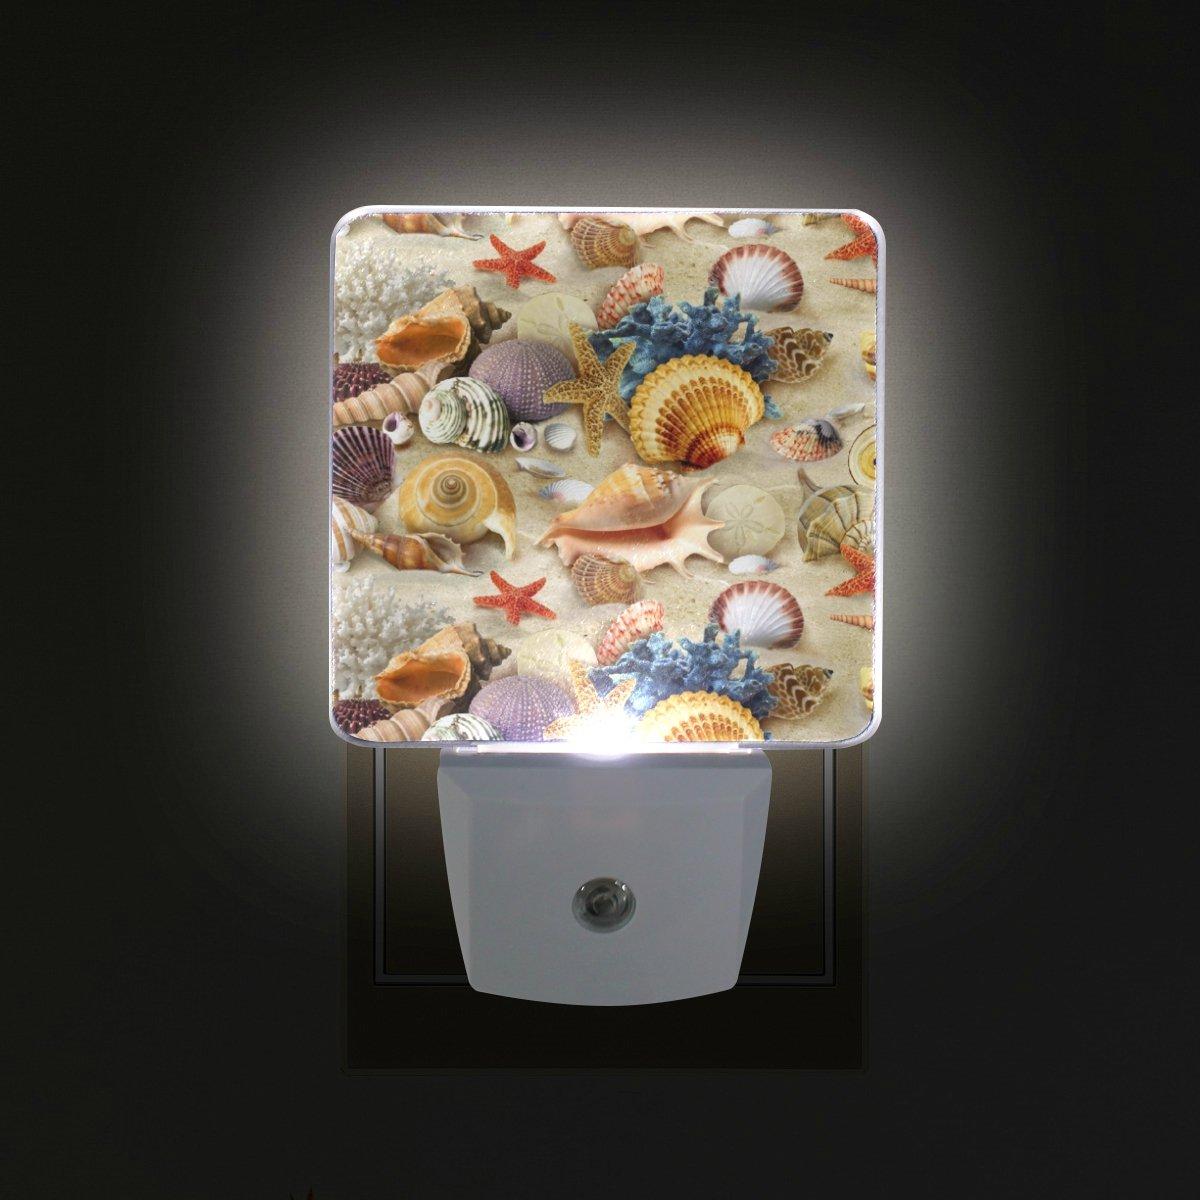 giovanior海スタイルサンドビーチヒトデ貝プラグin Dusk to DawnライトセンサーLEDナイトライトウォールライトの寝室、バスルーム、廊下、階段、エネルギー効率的な B079M3RDHX 15675